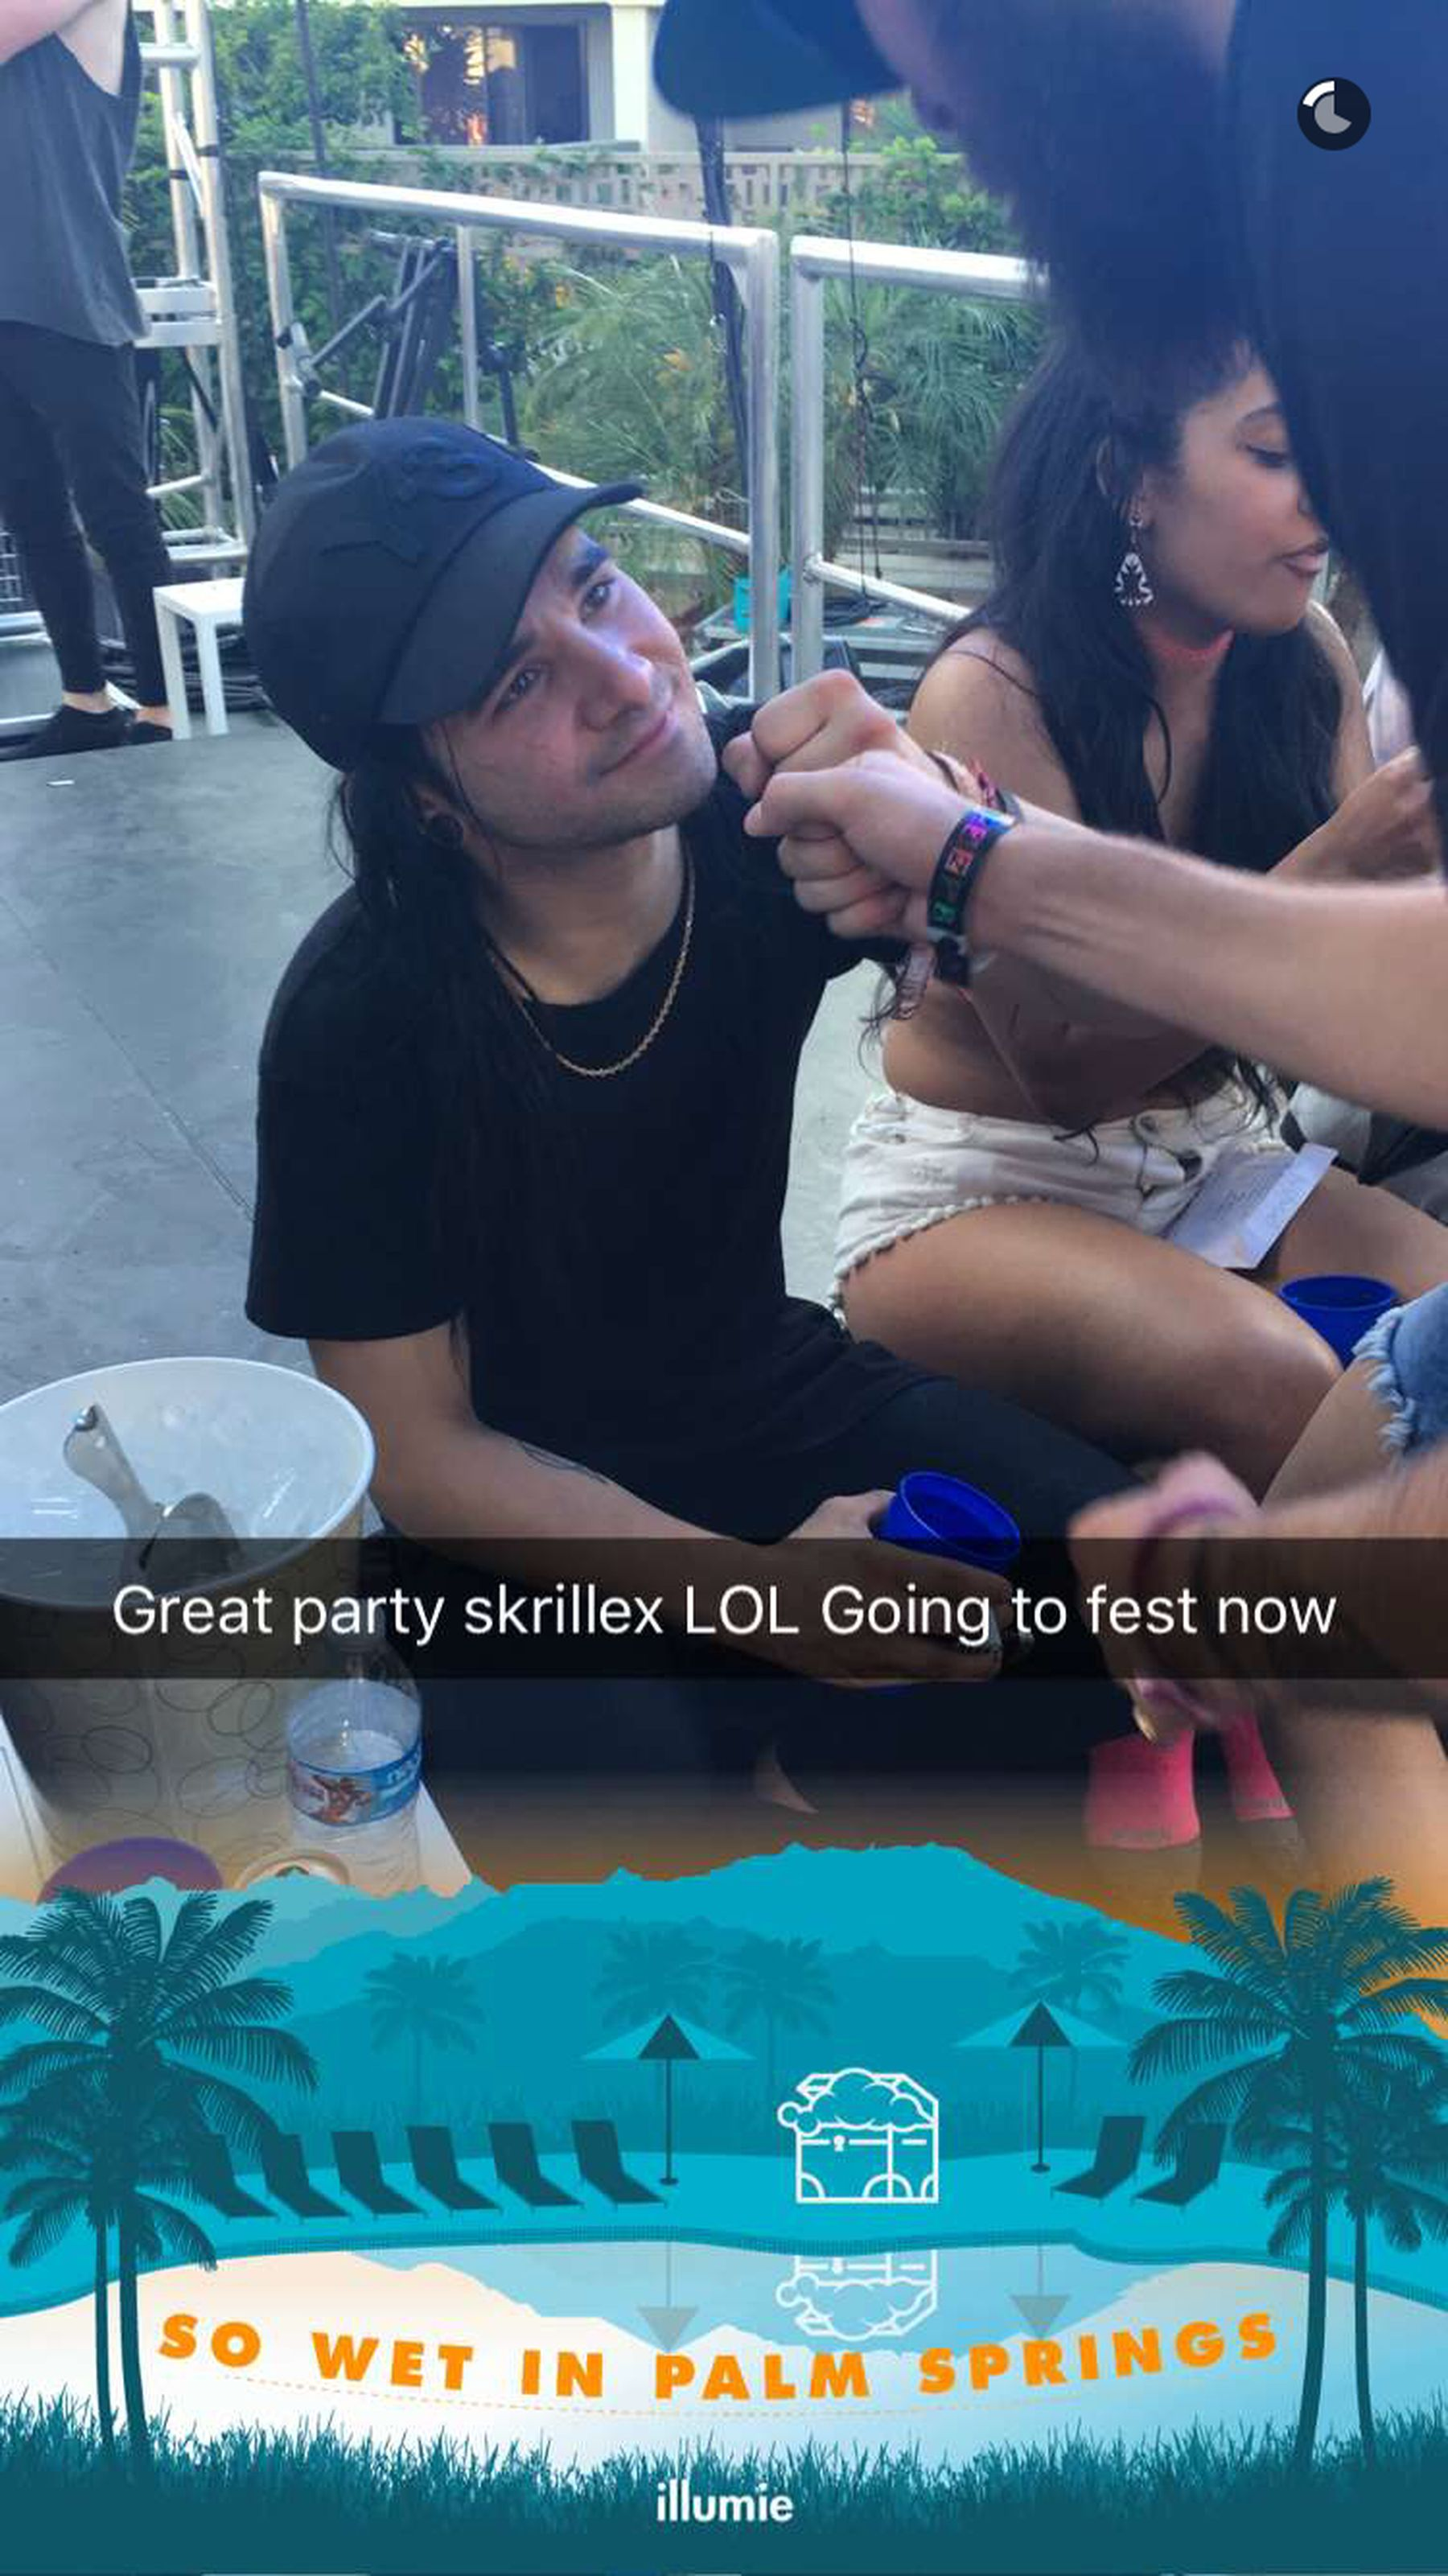 Skrillex at Coachella after his show on Troian's S